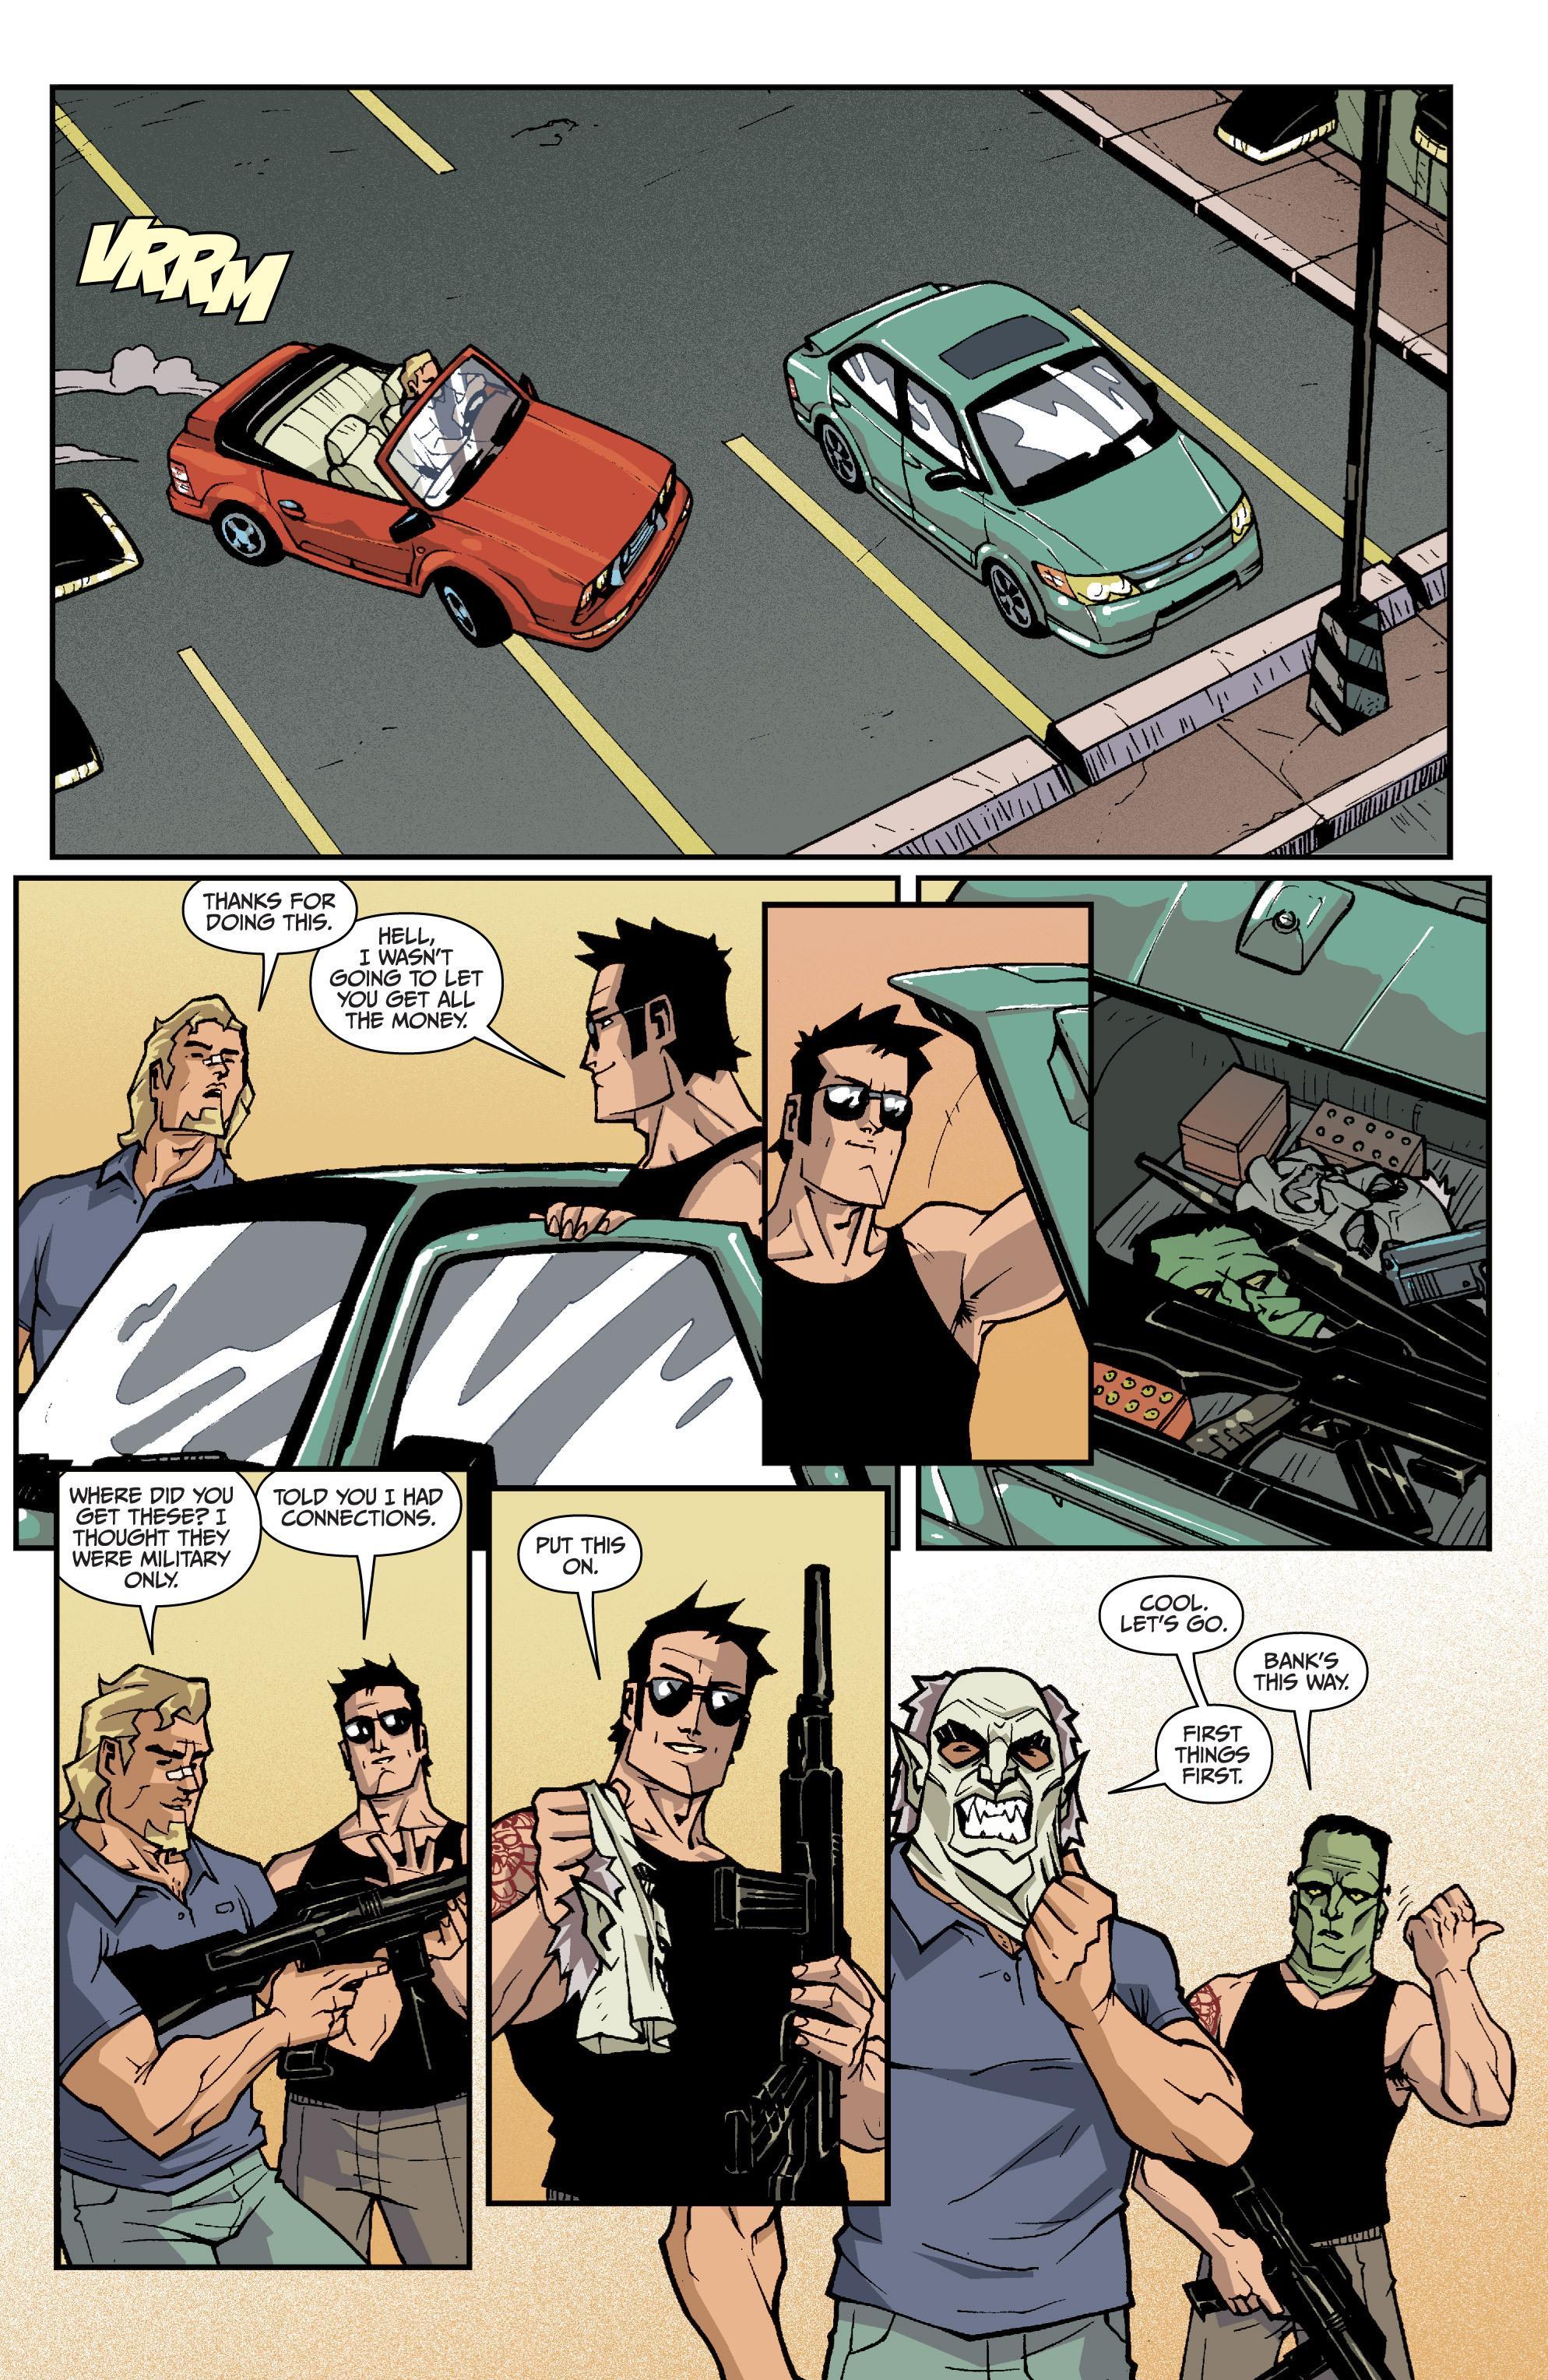 2 Guns Graphic novel review